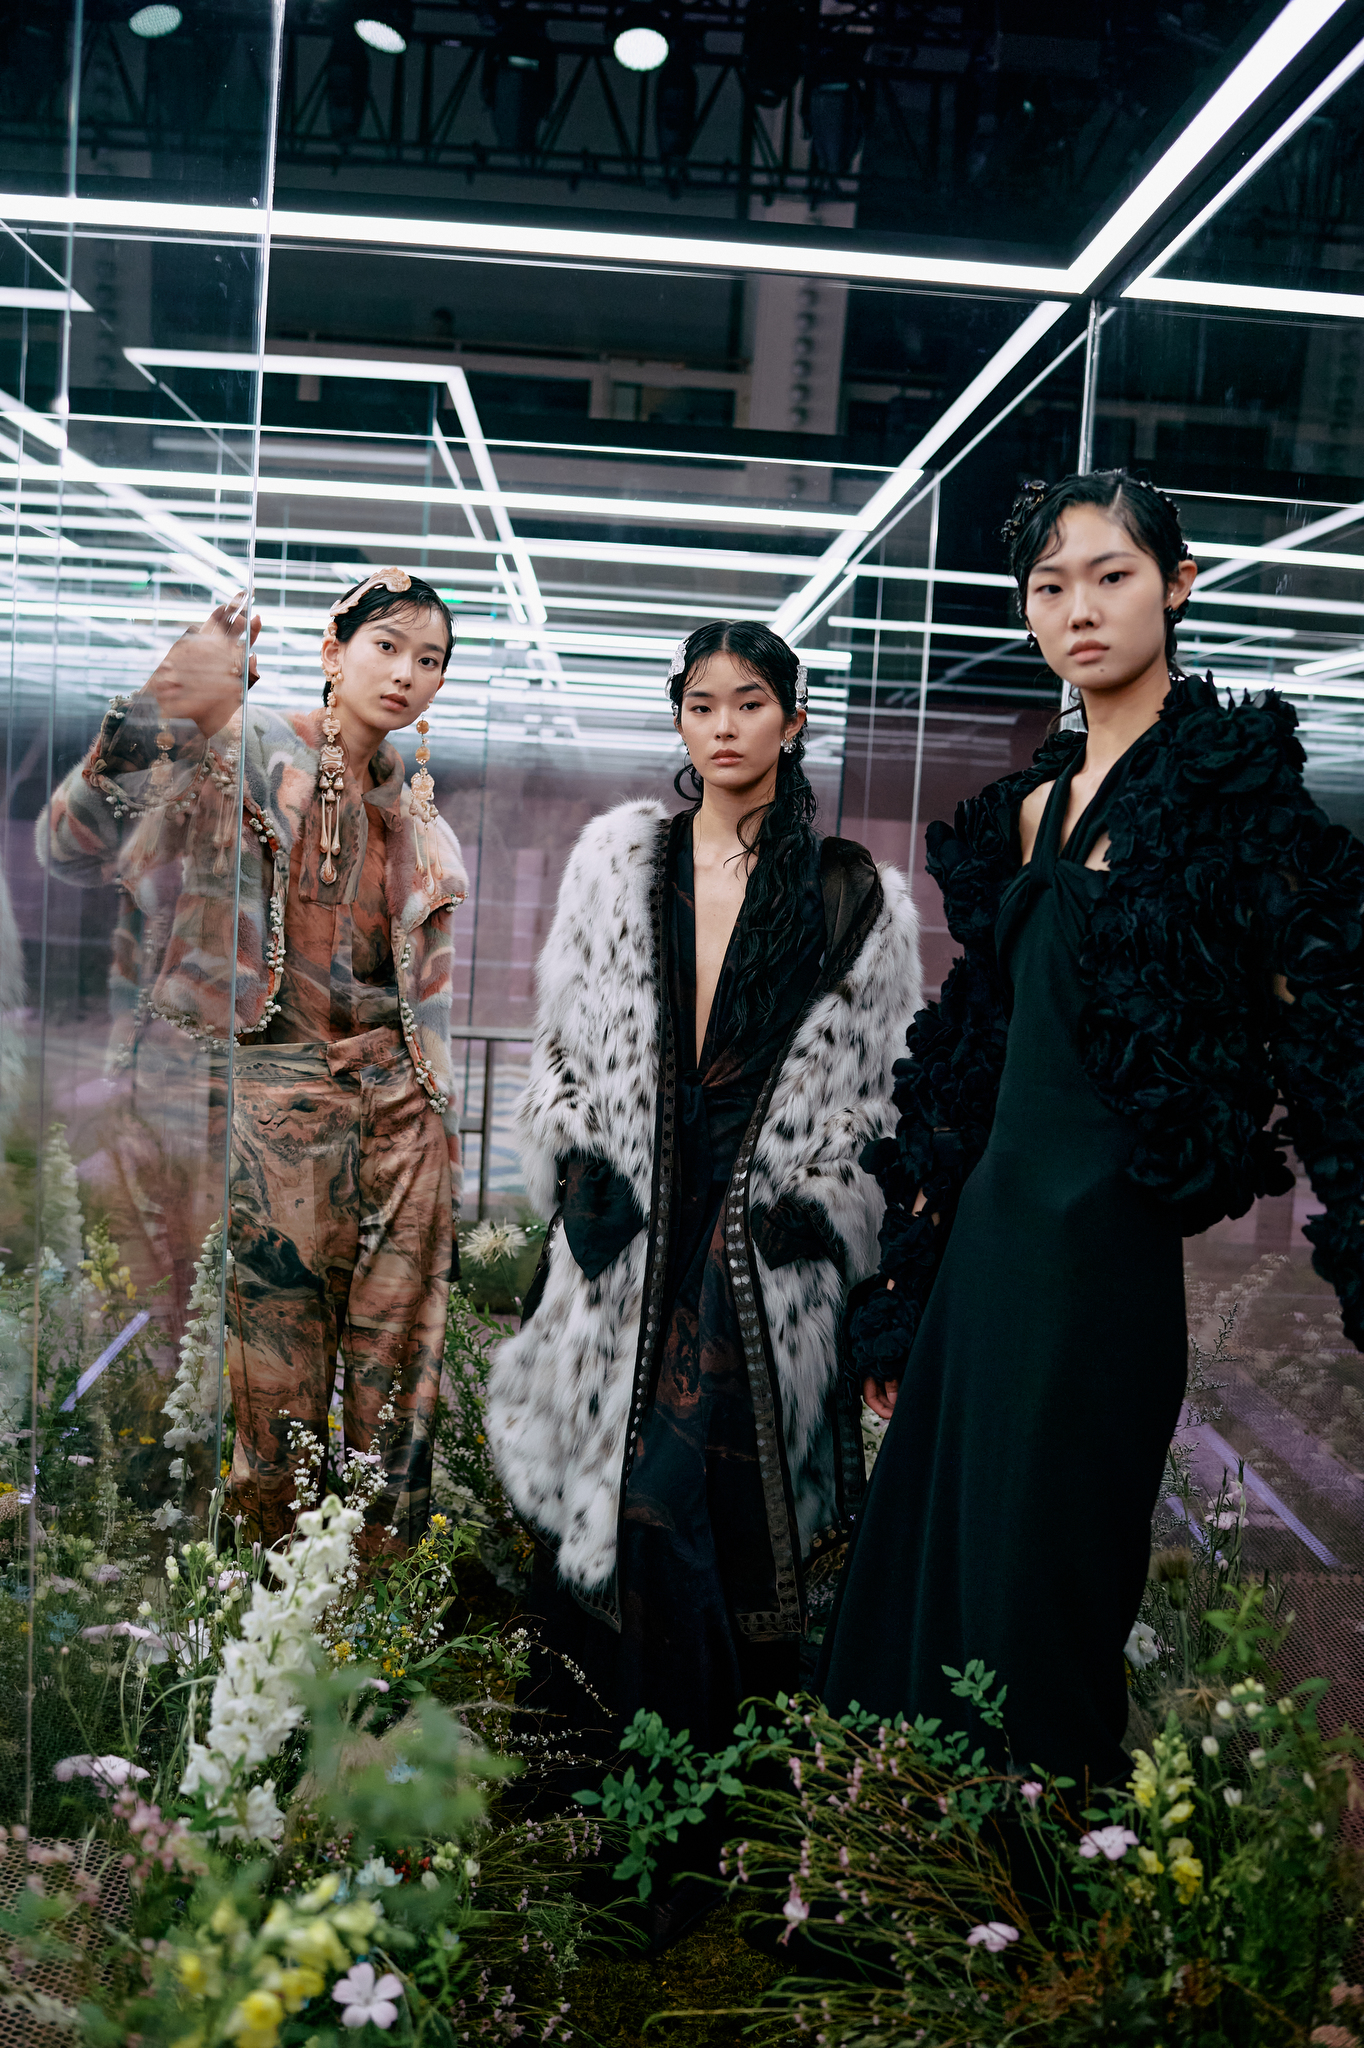 Fendi Couture Spring 2021 in Shanghai